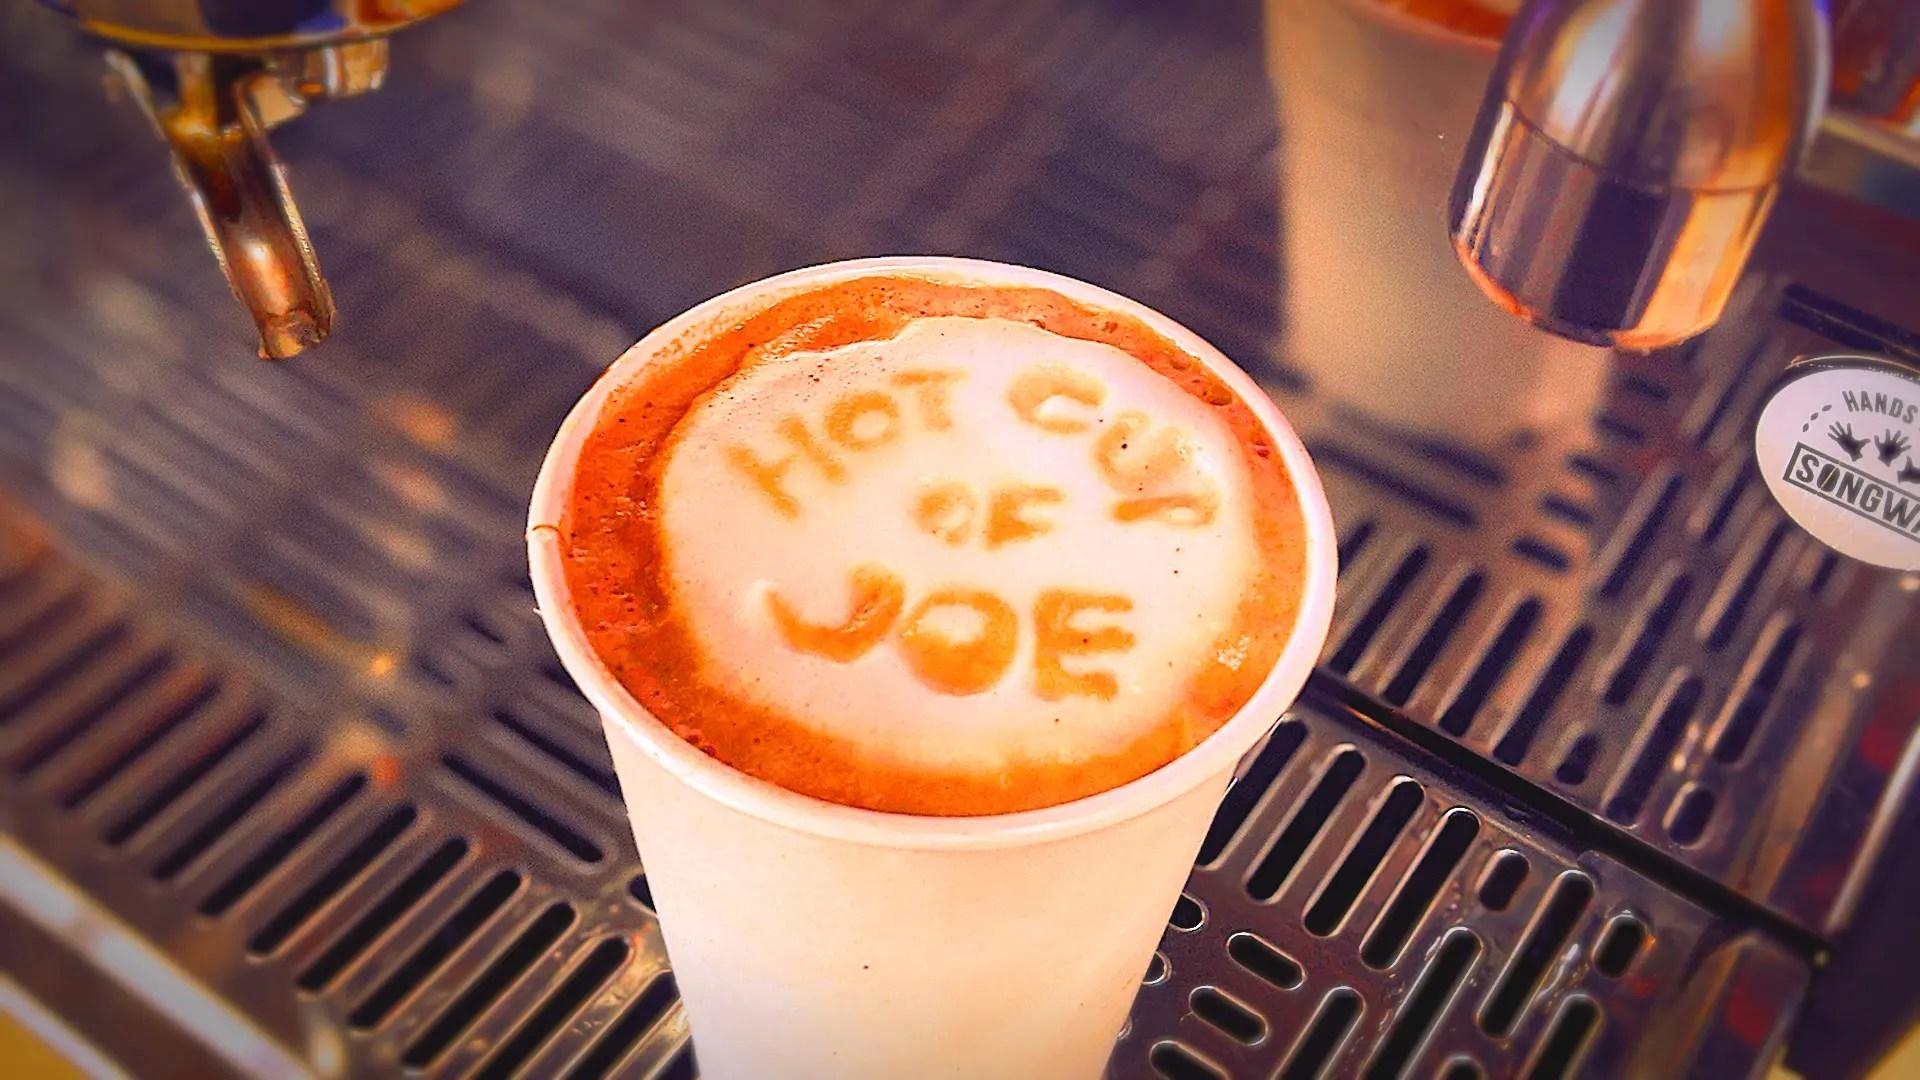 Hot Cup of Joe